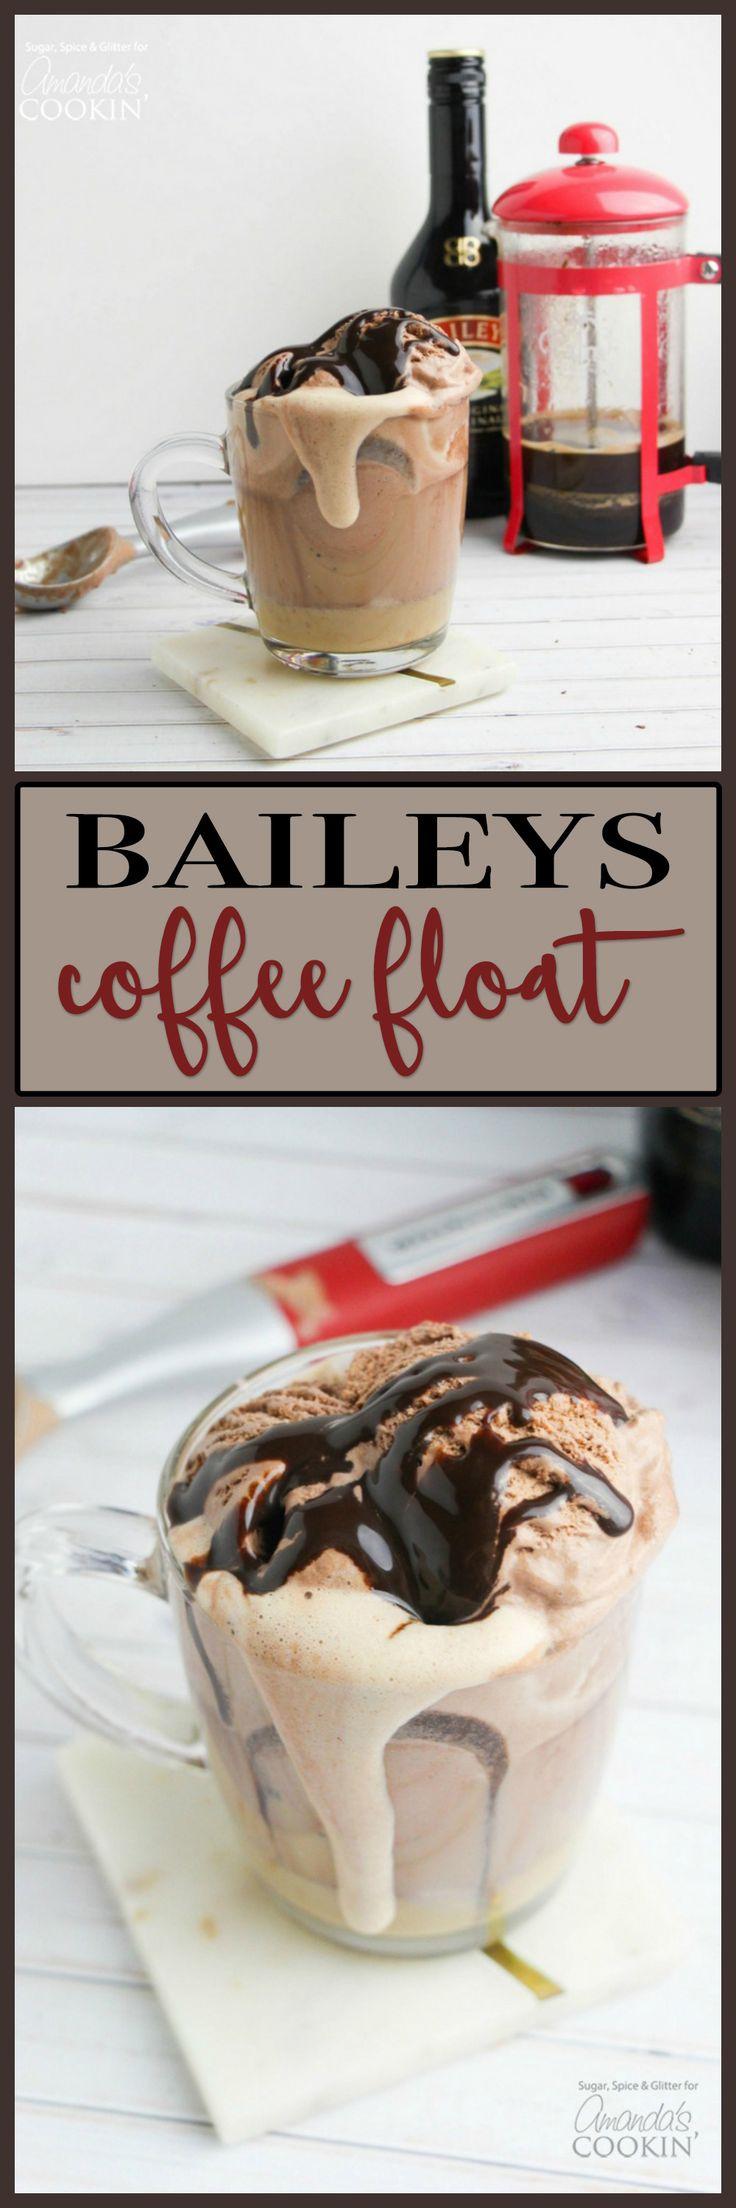 Baileys Coffee Float